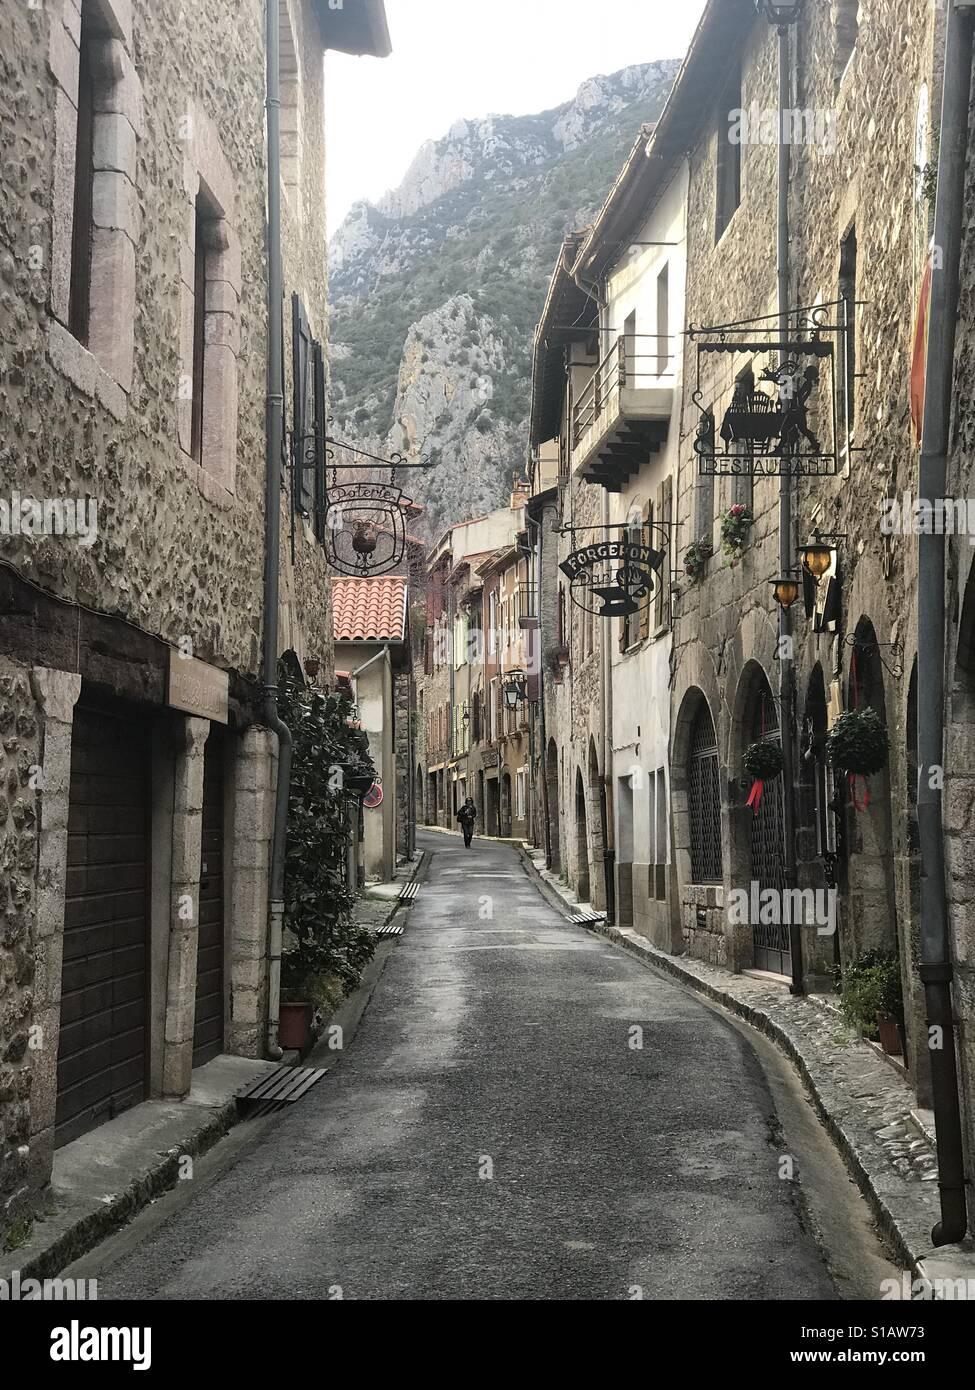 Villefranche de Conflent, midi Pyrenees, France - Stock Image